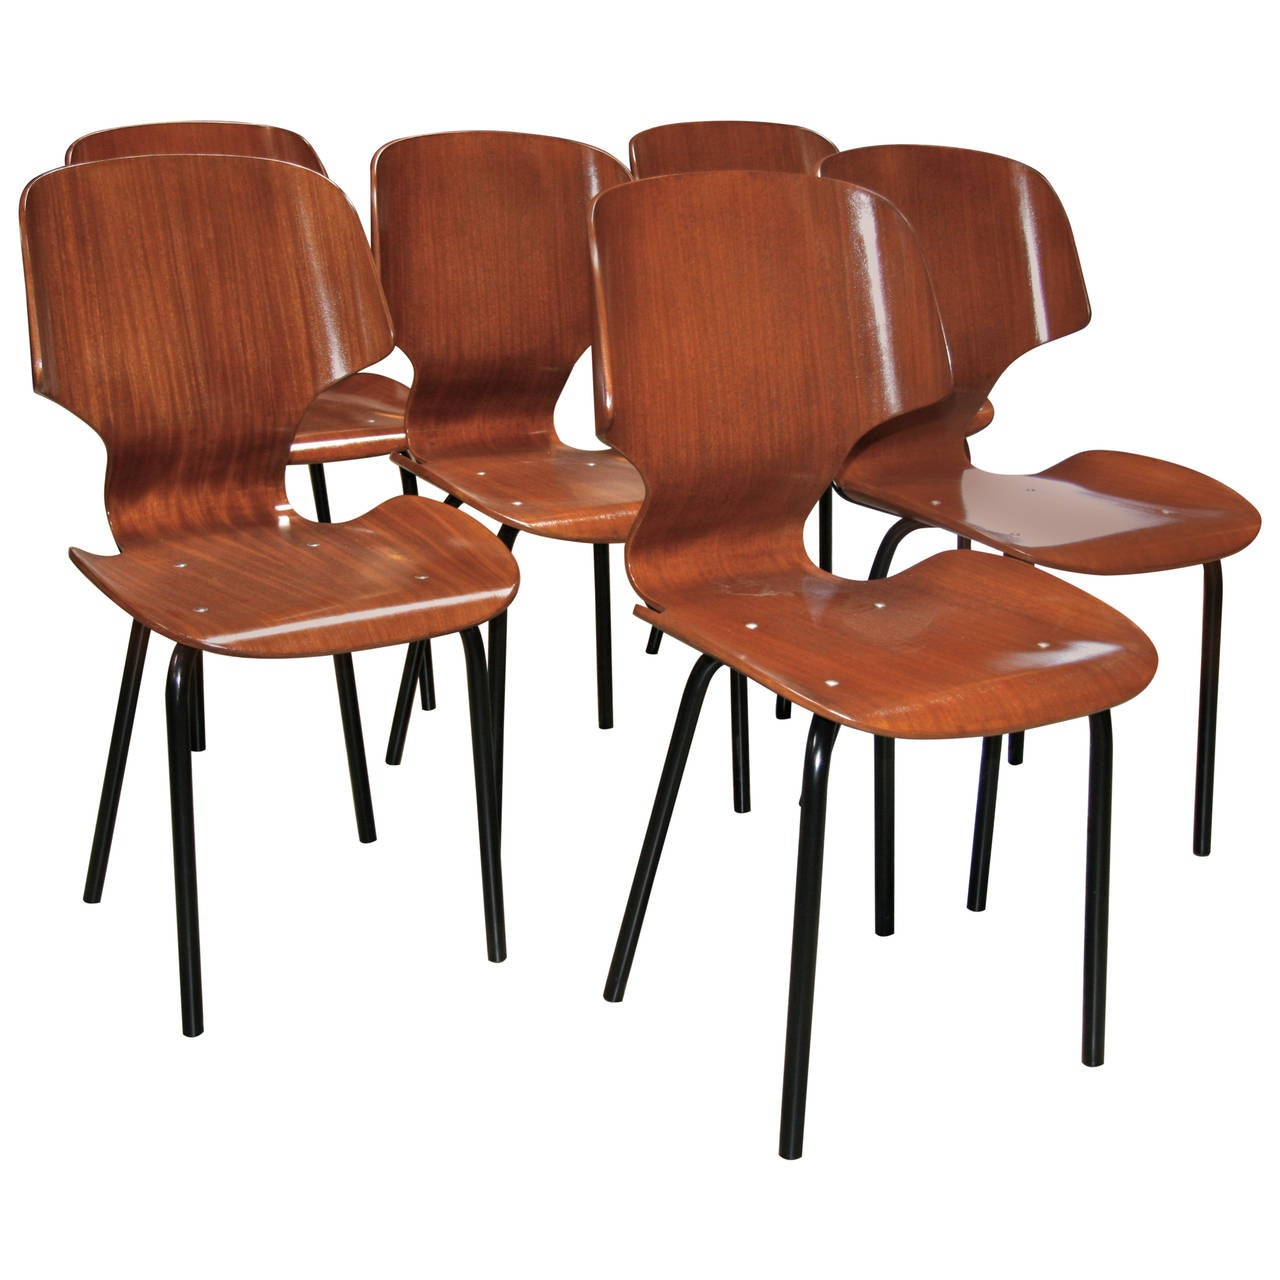 Set of Six Chairs by Carlo Ratti, 1955